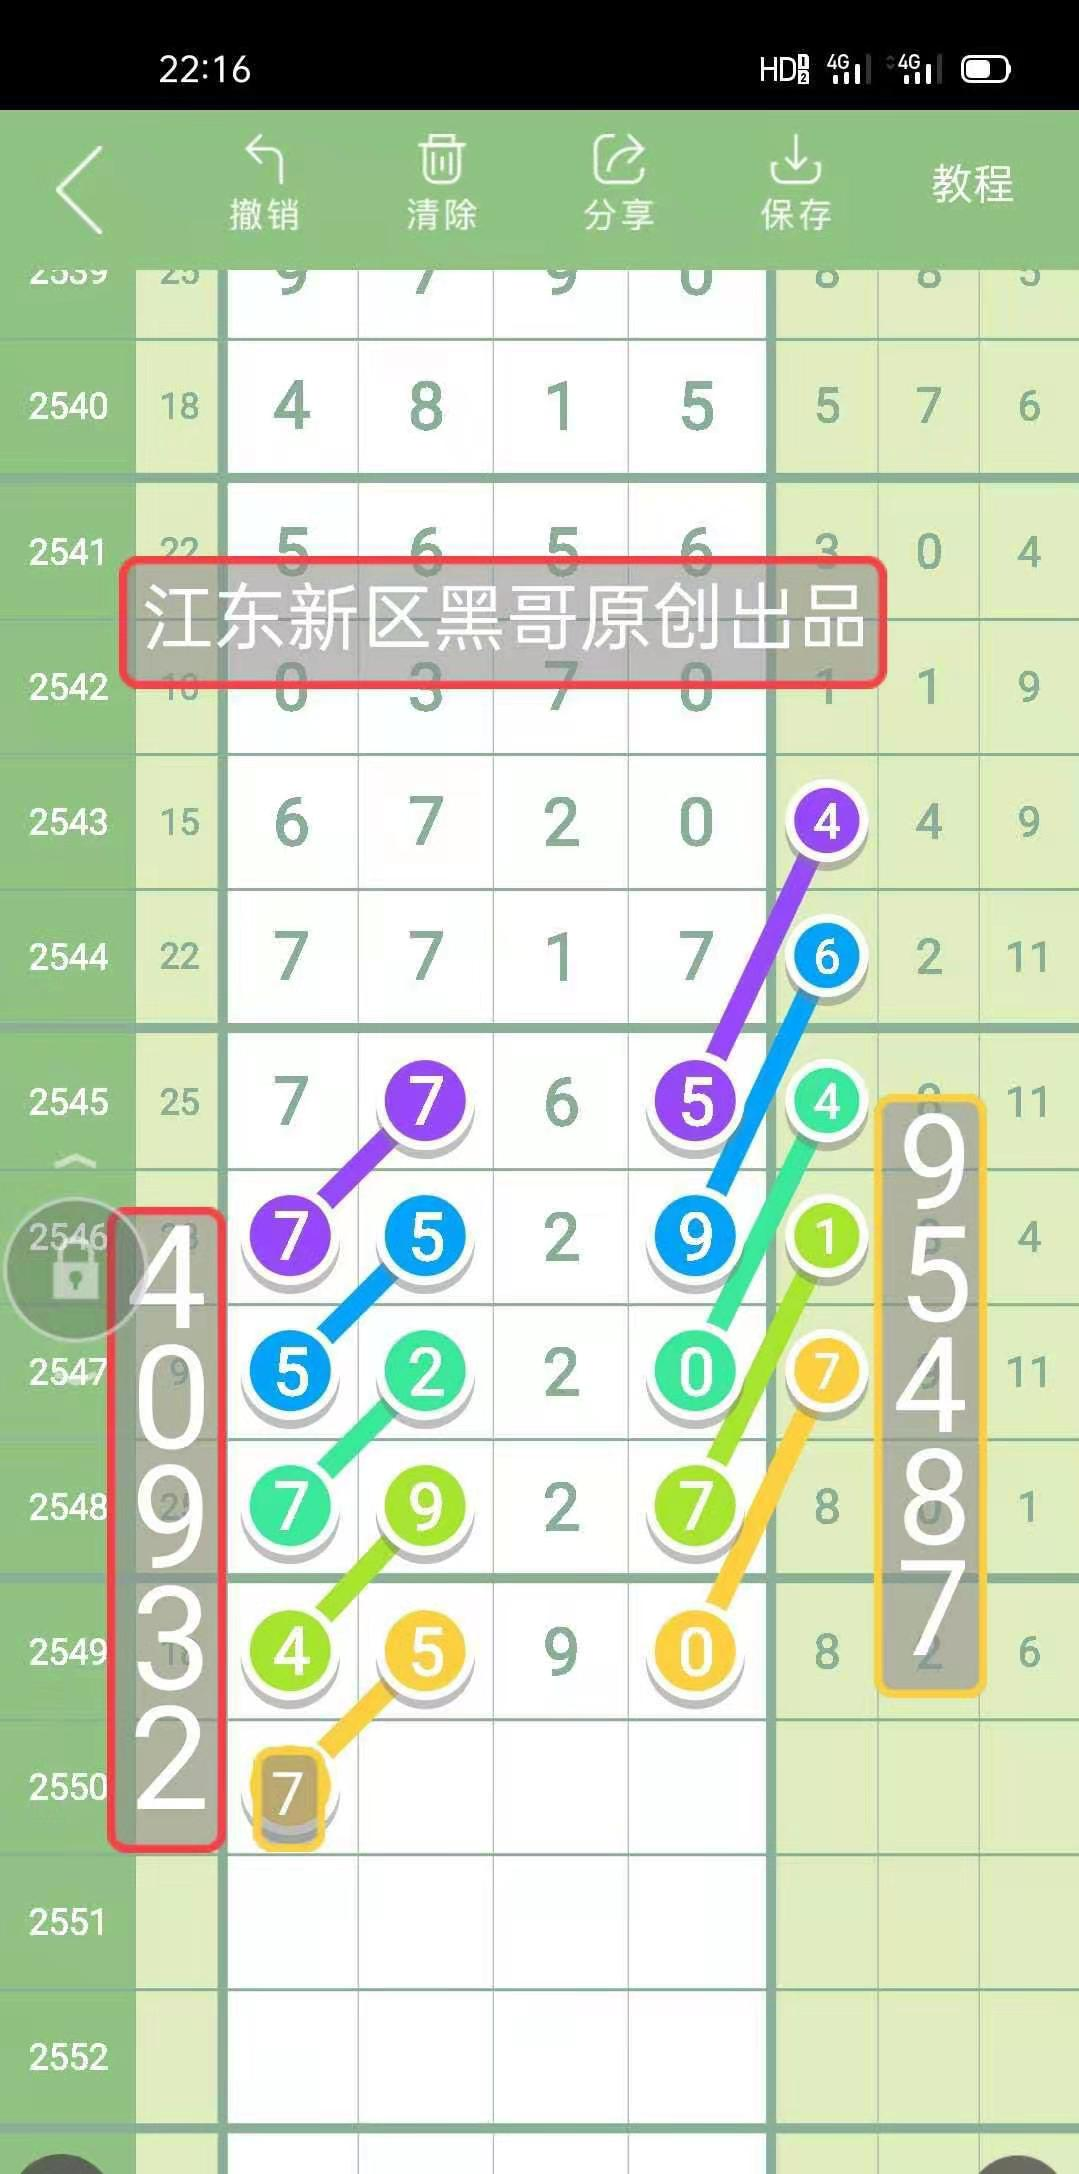 52dc8854f9a770e7d1f4bd112312c6d.jpg